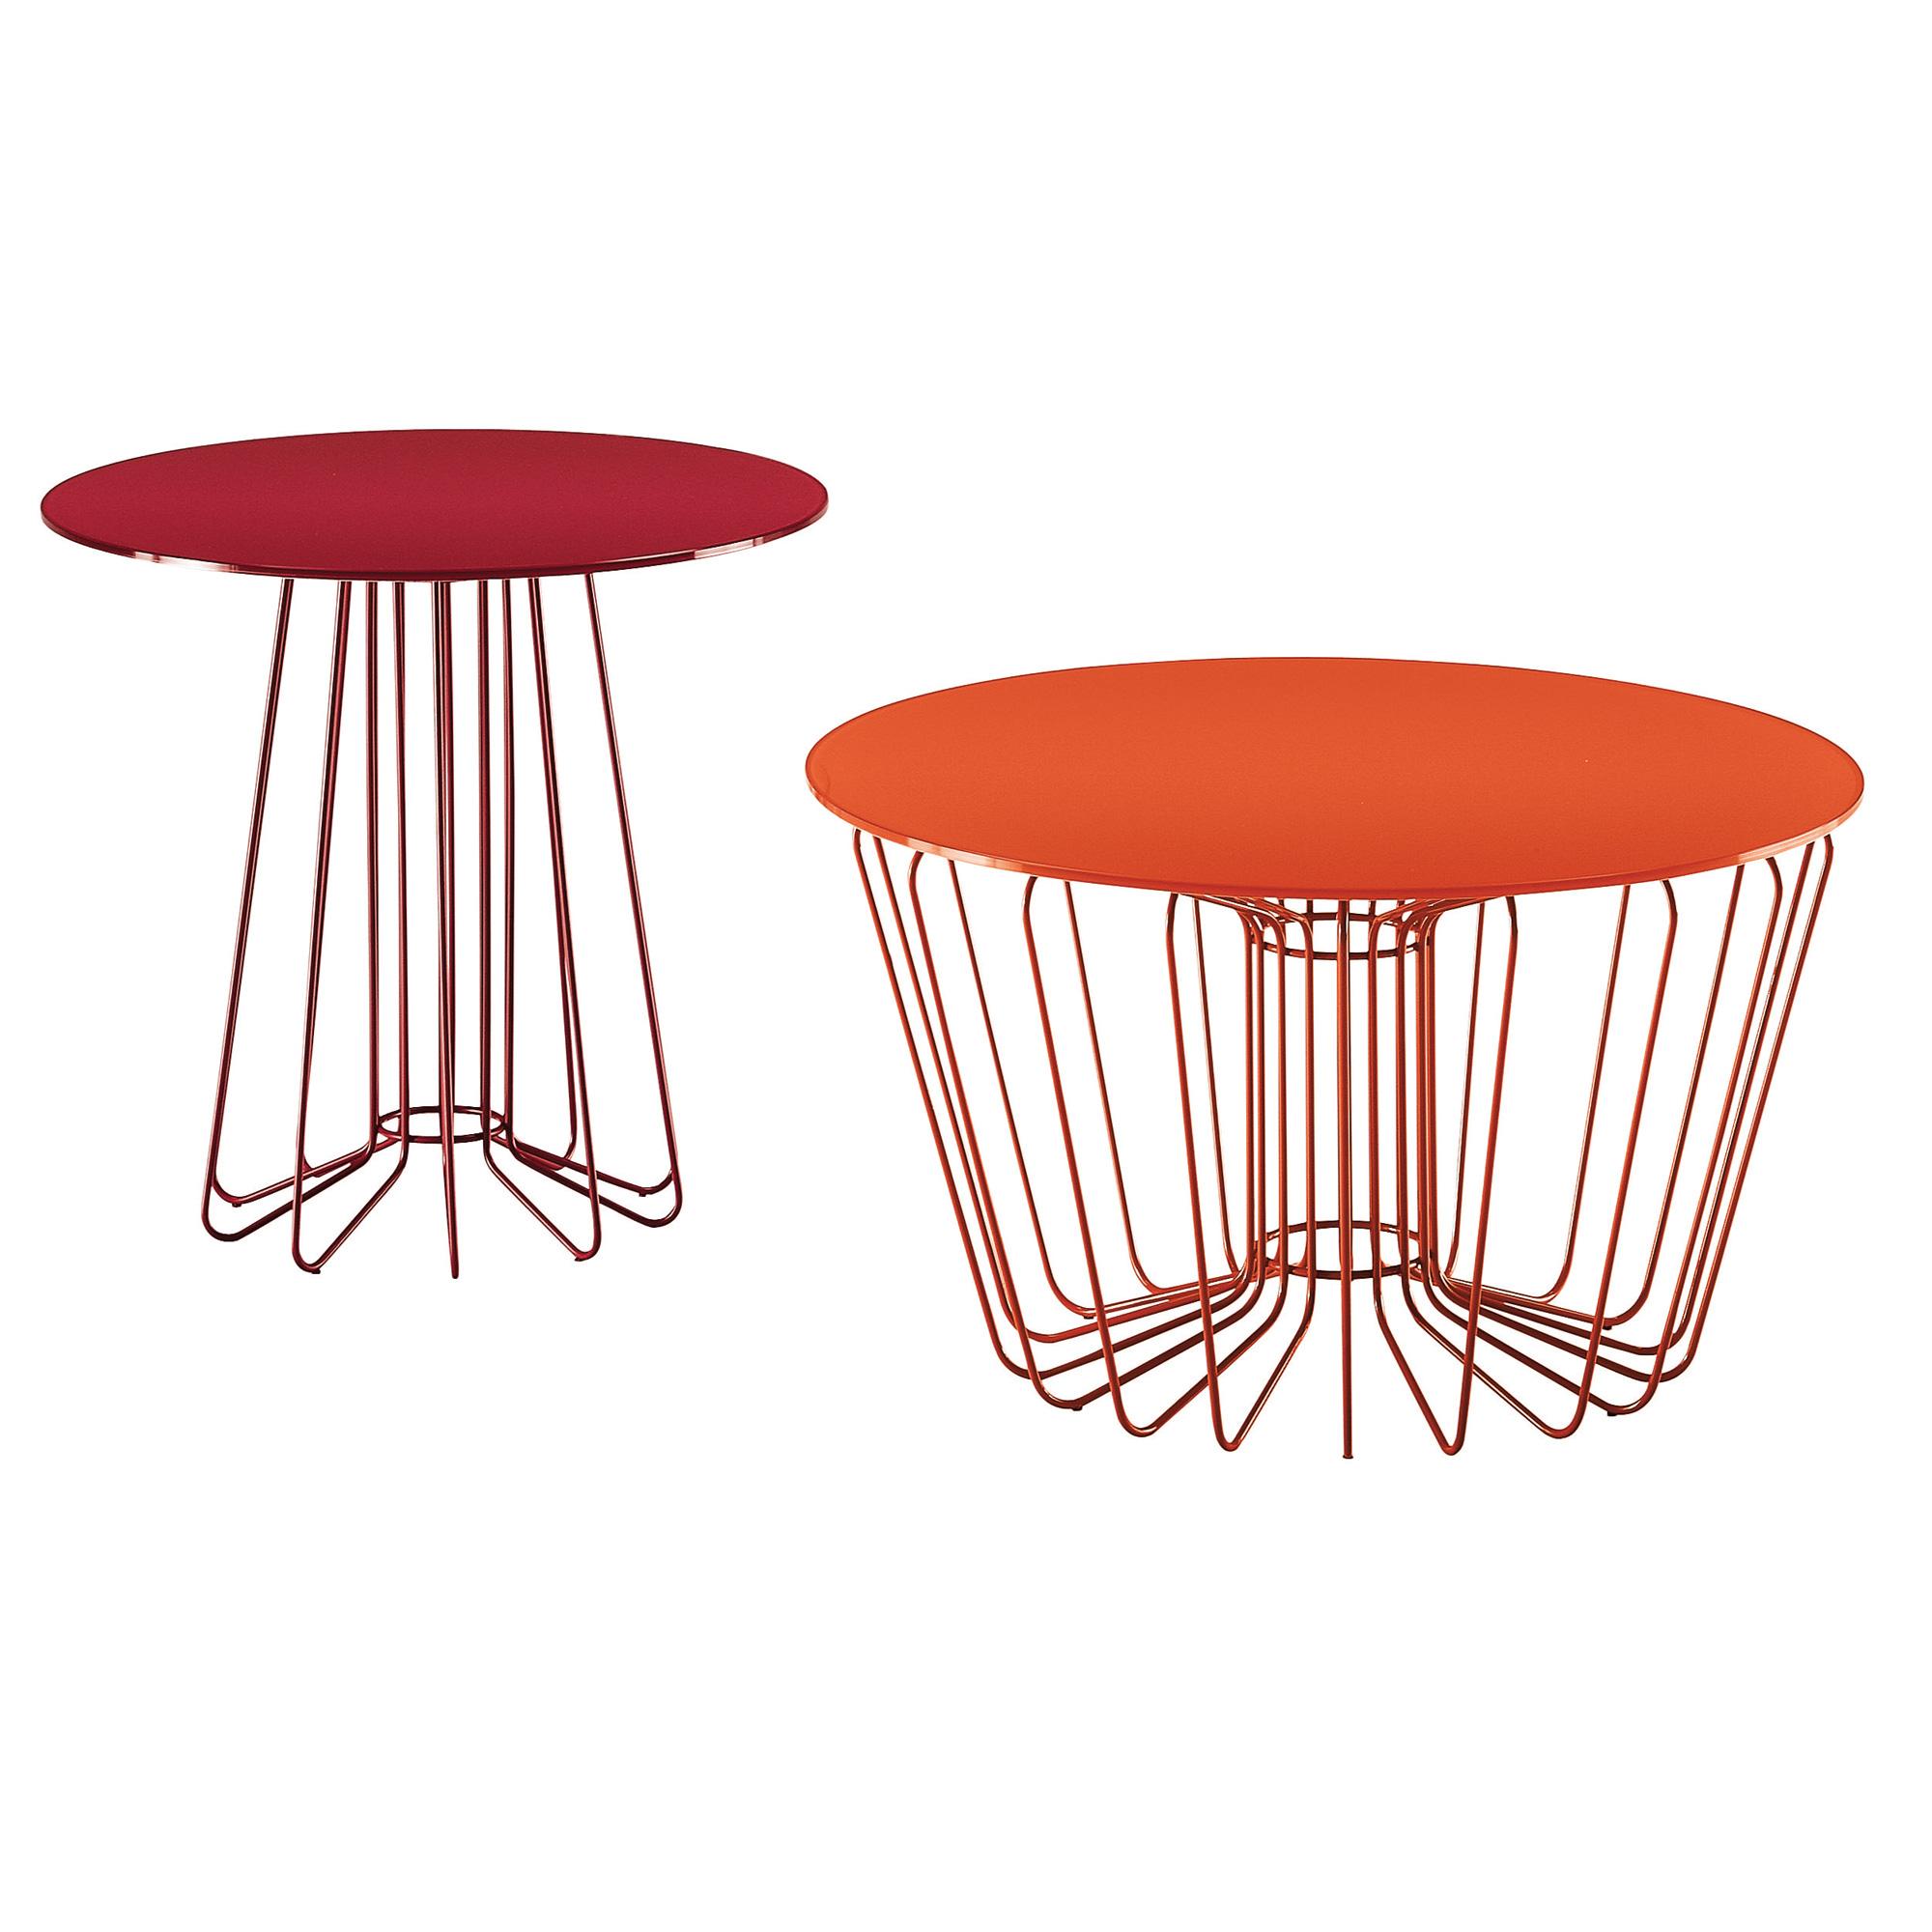 zanotta 651 smallwire beistelltisch 651 rot reuter. Black Bedroom Furniture Sets. Home Design Ideas